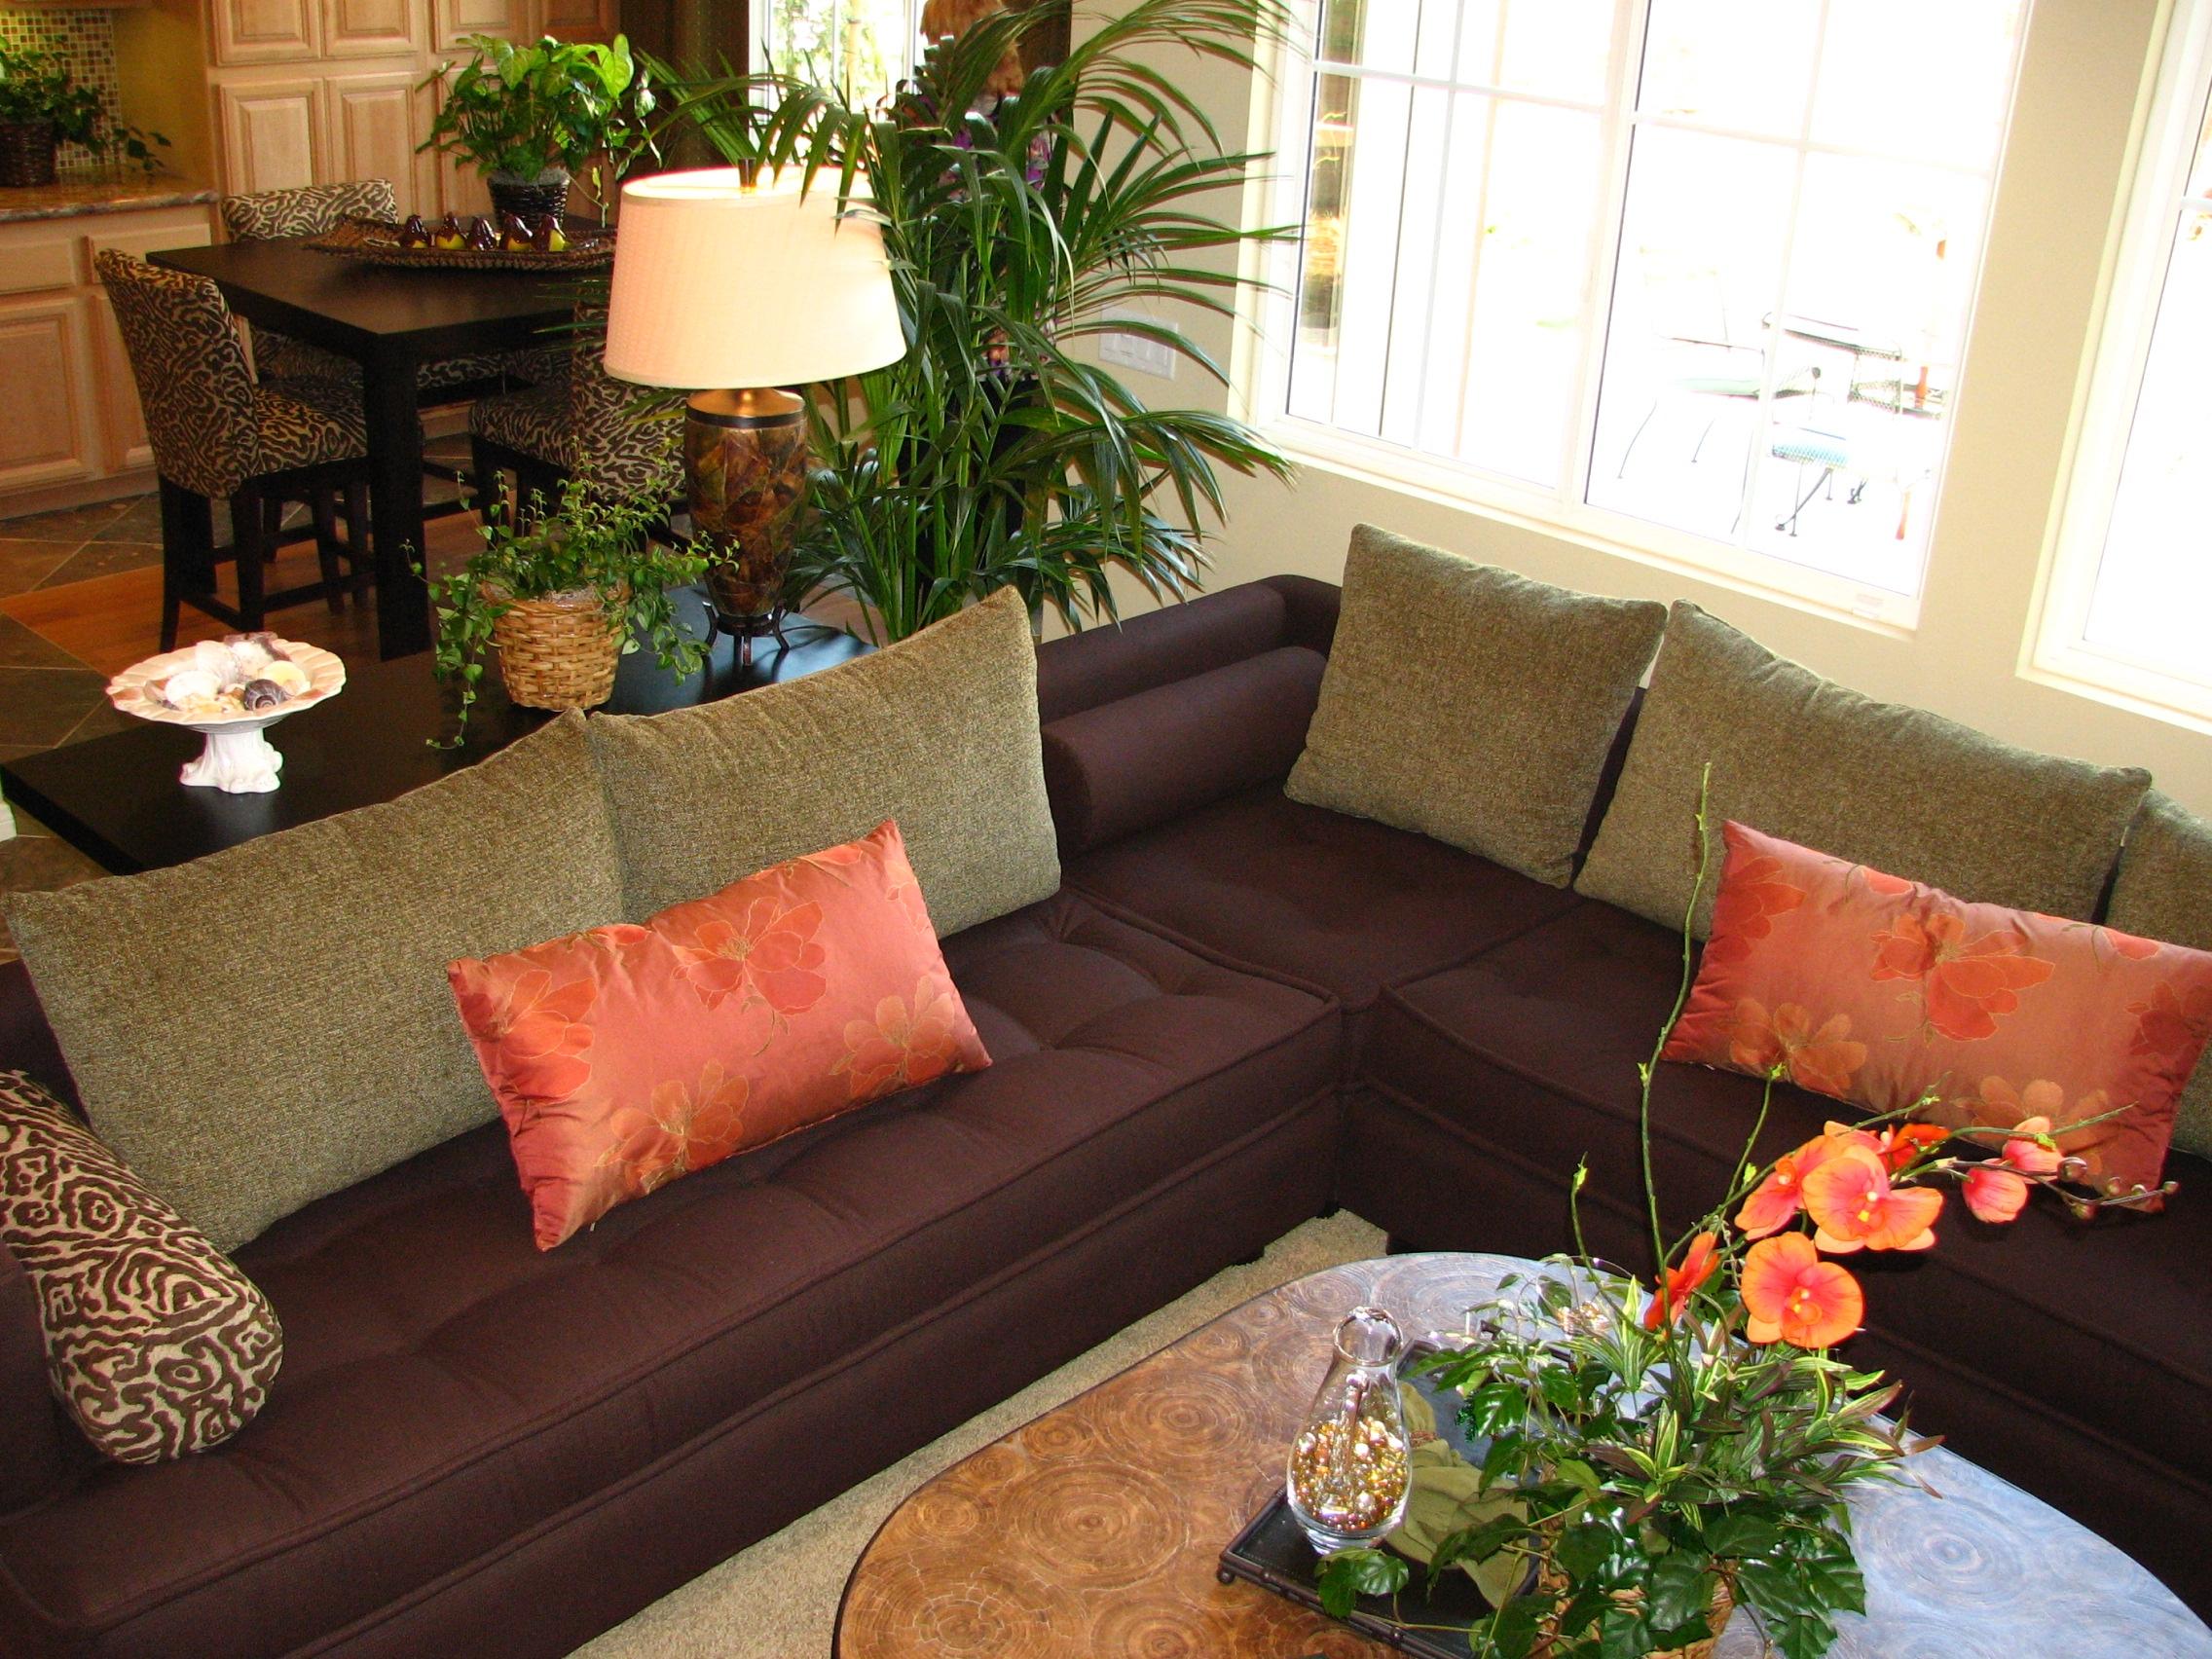 furniture arrangement  Feng Shui that Makes Sense by